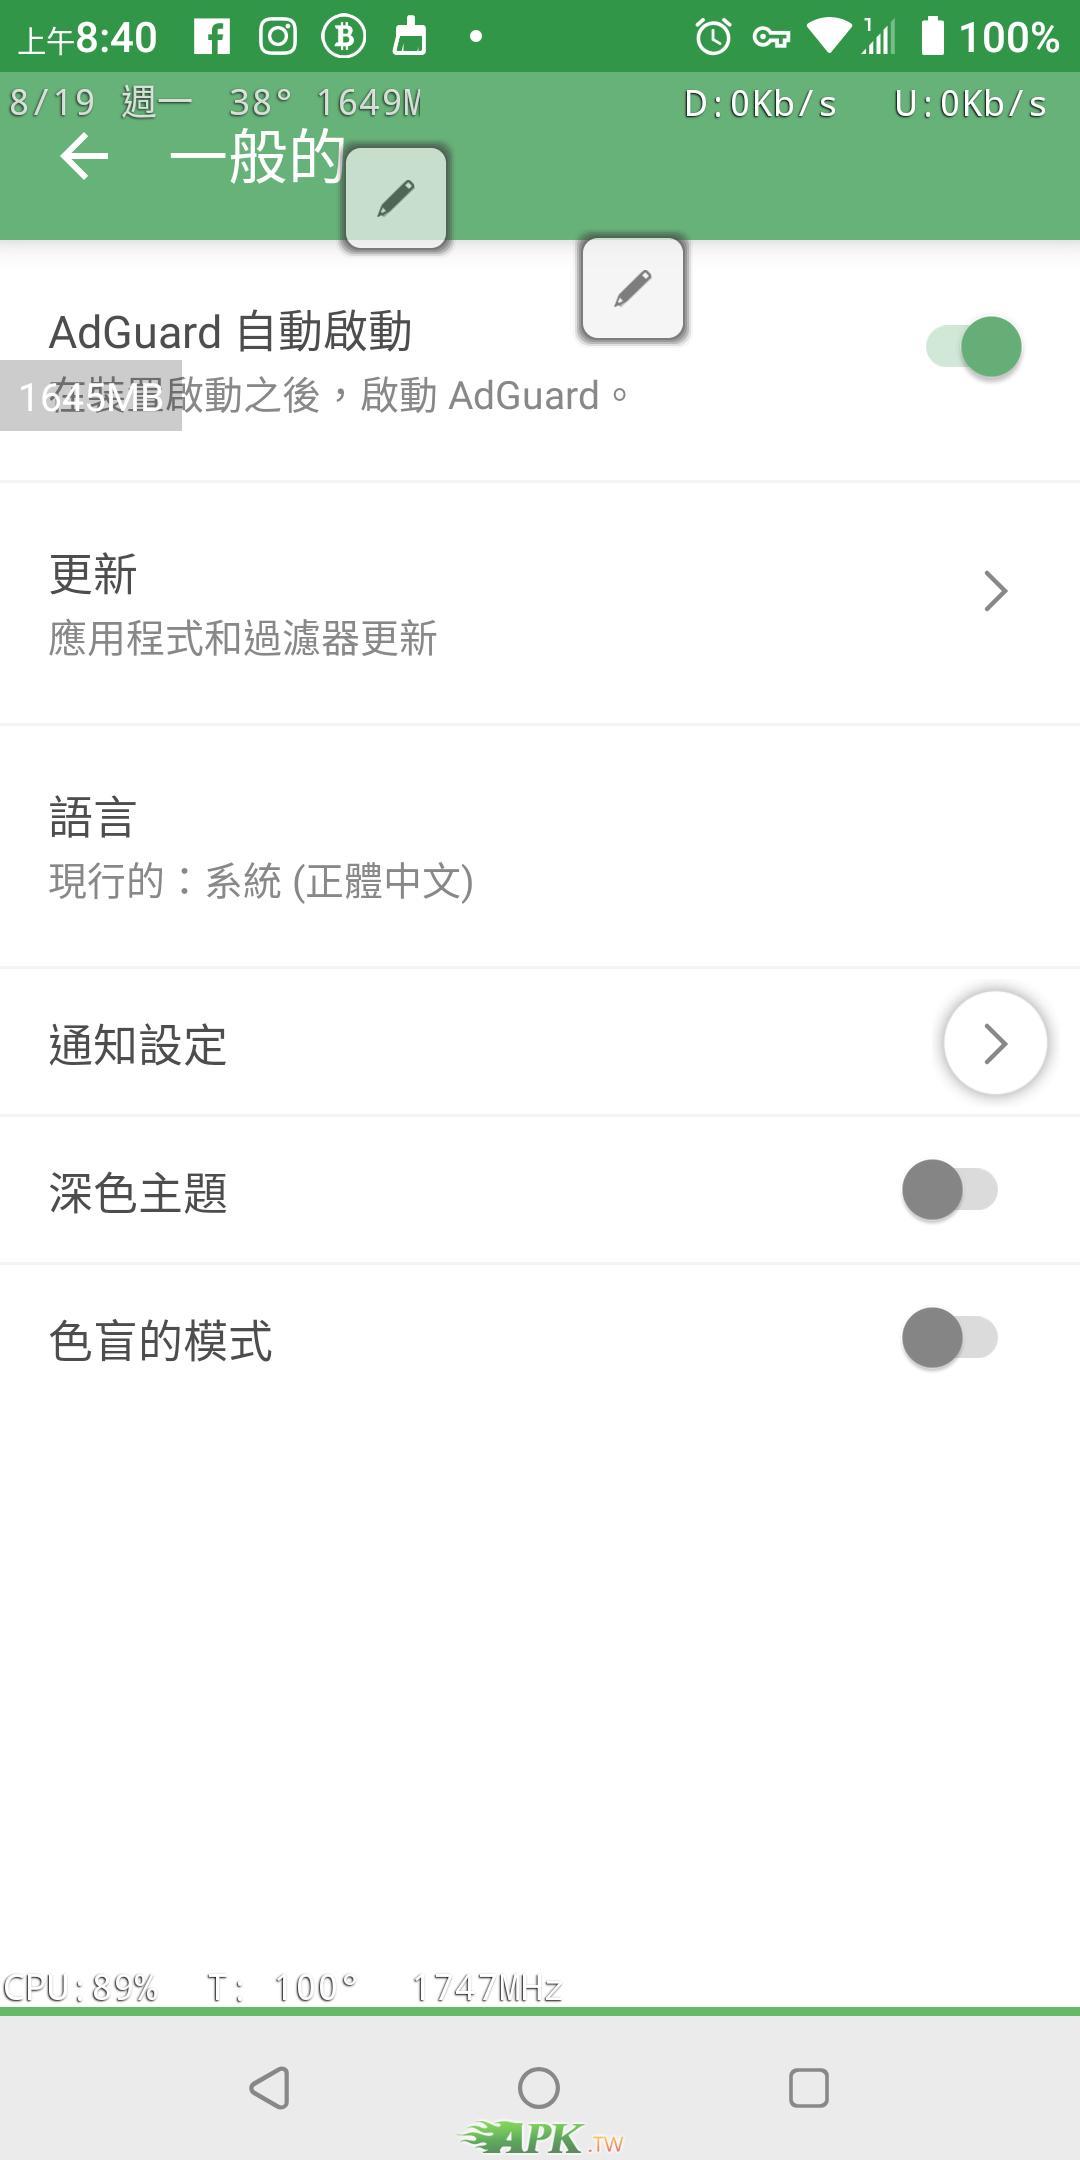 Screenshot_20190819-084029.png